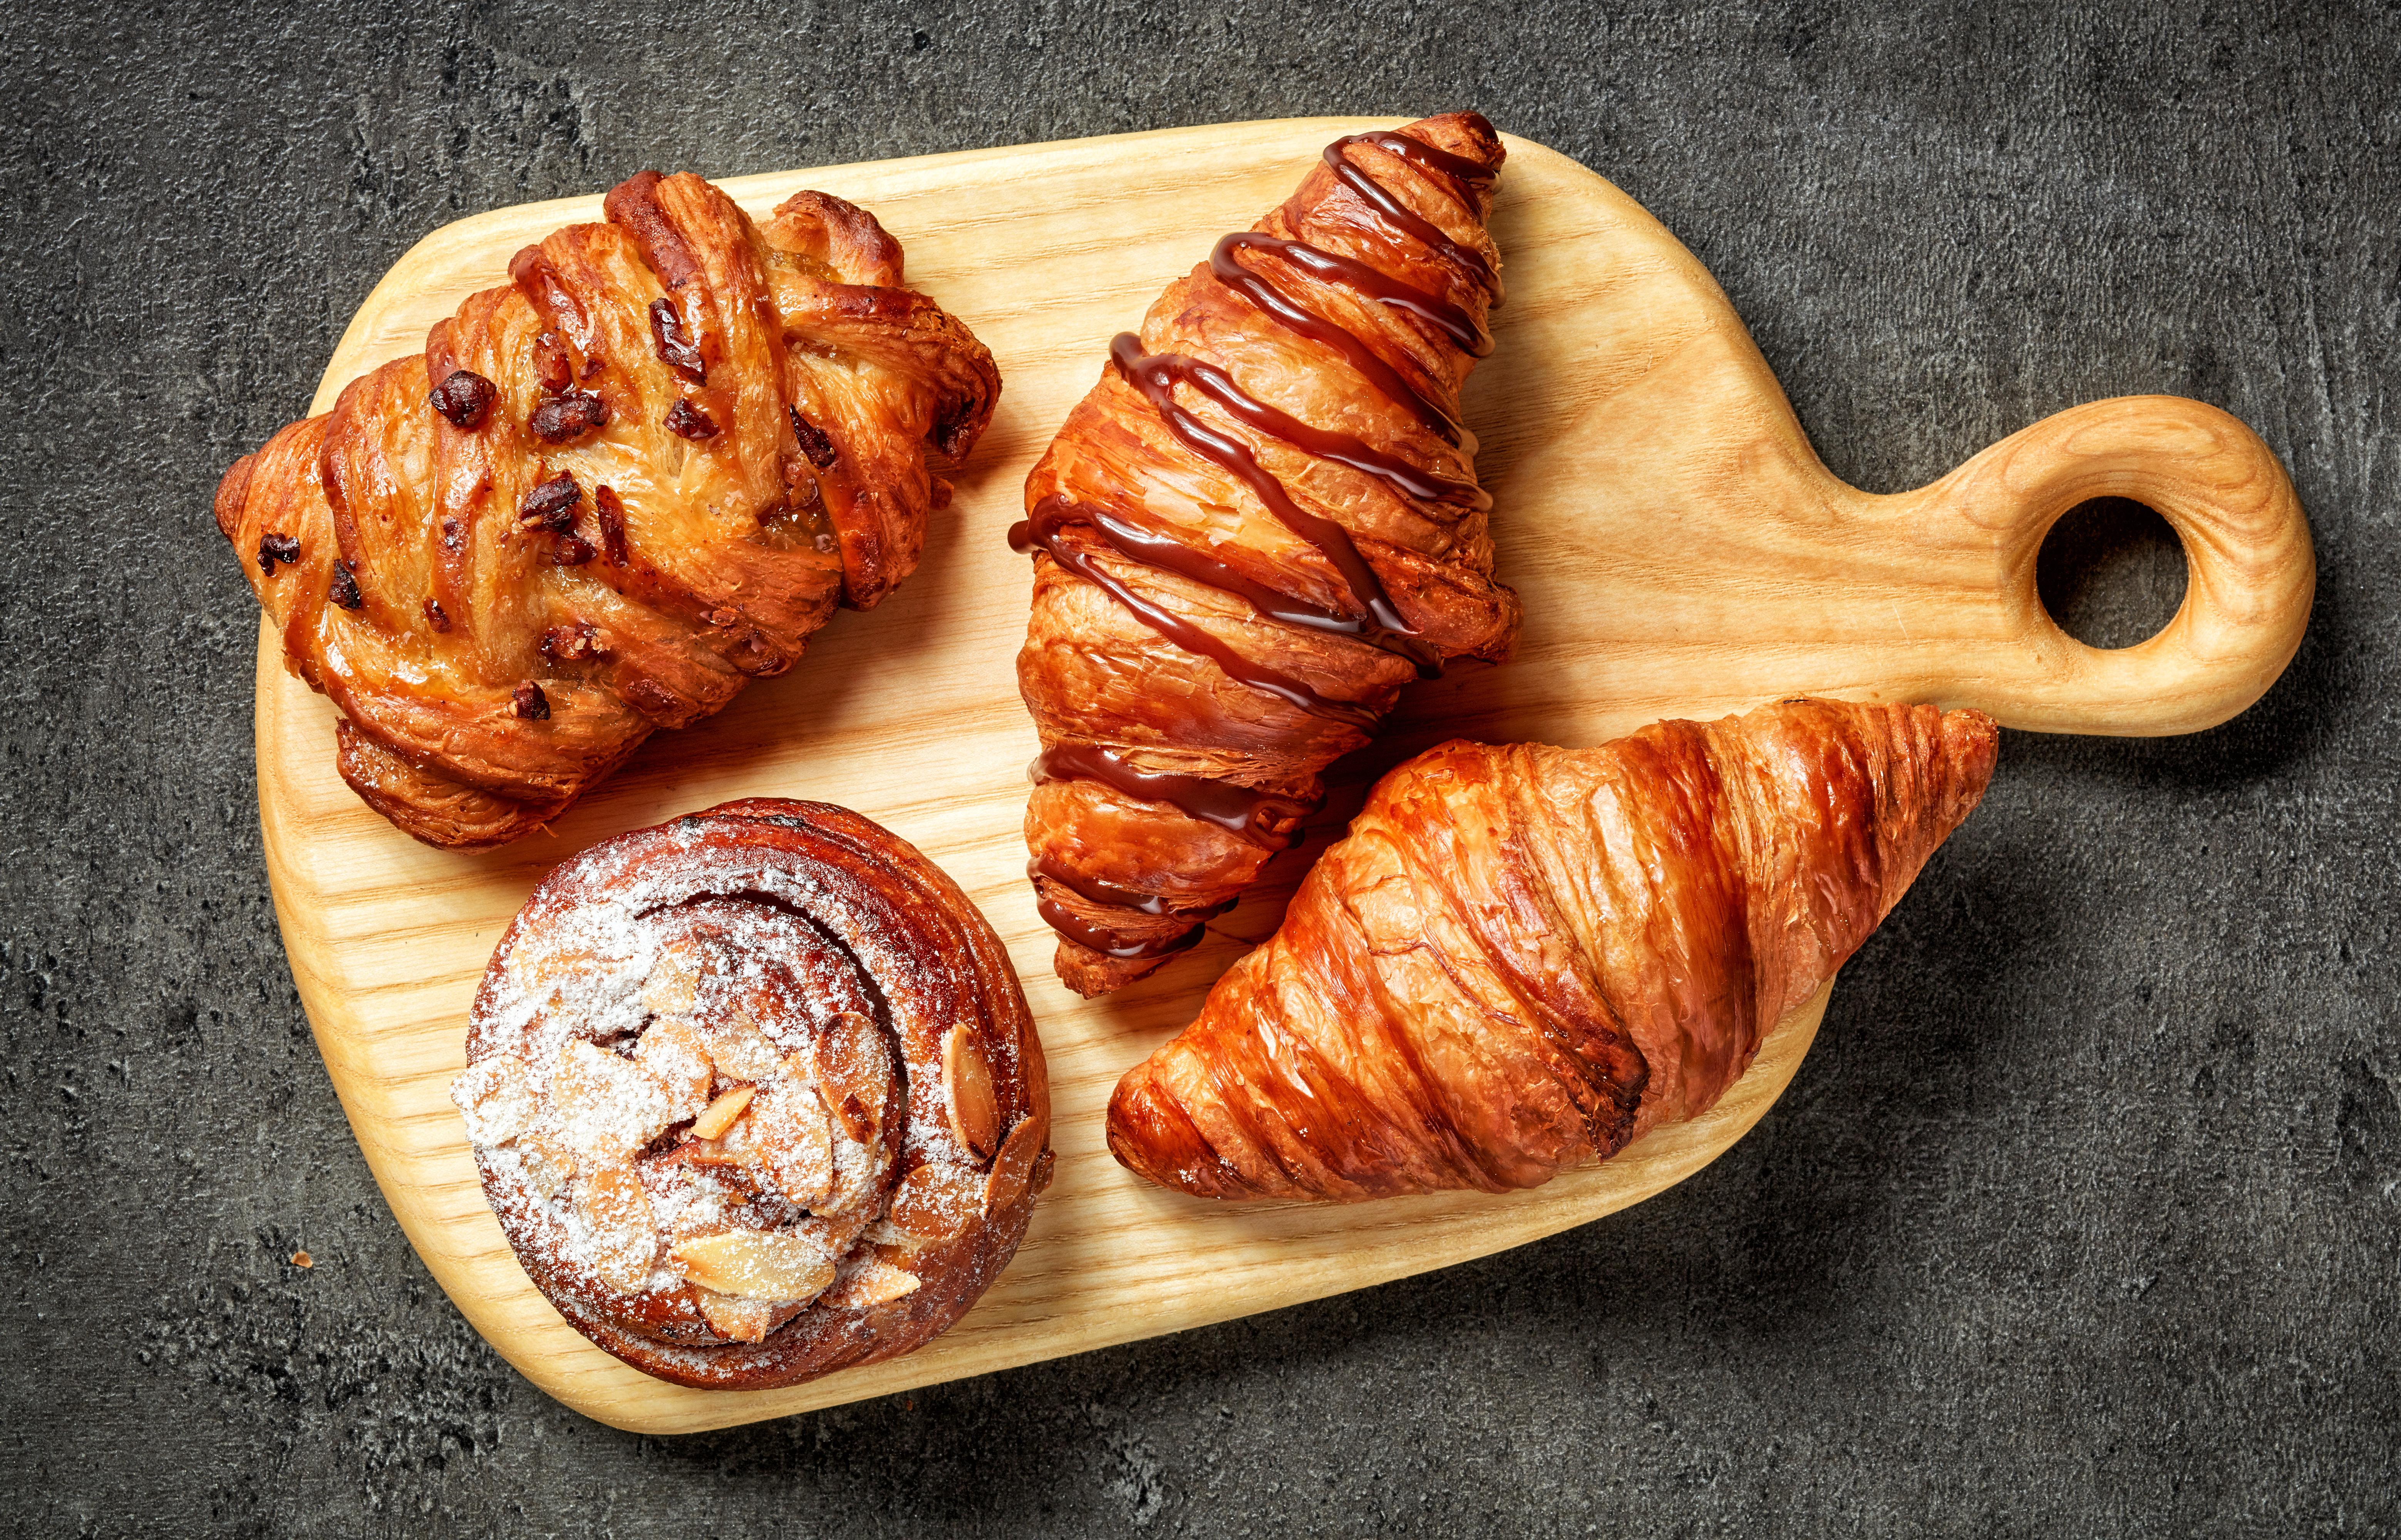 various-freshly-baked-pastries-PLLRYEG